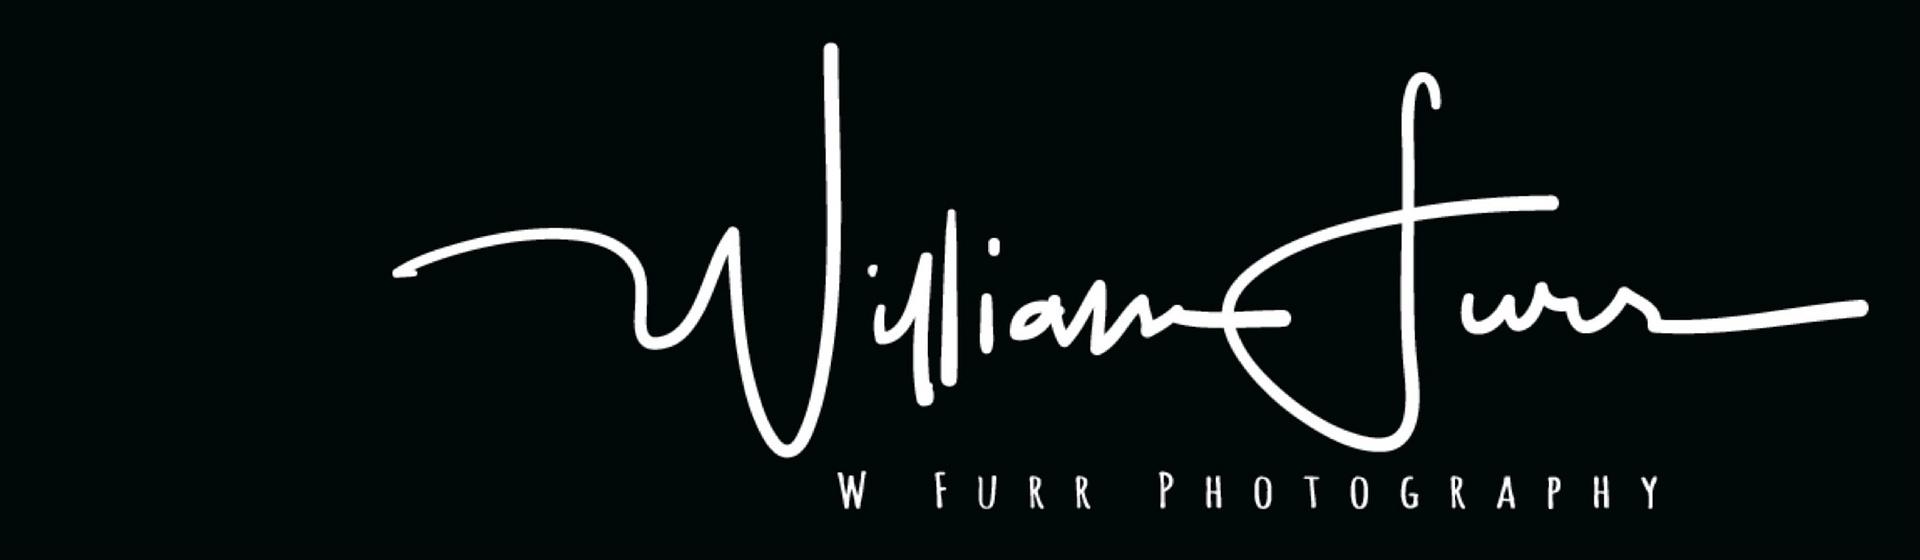 WilliamFurr's Gallery